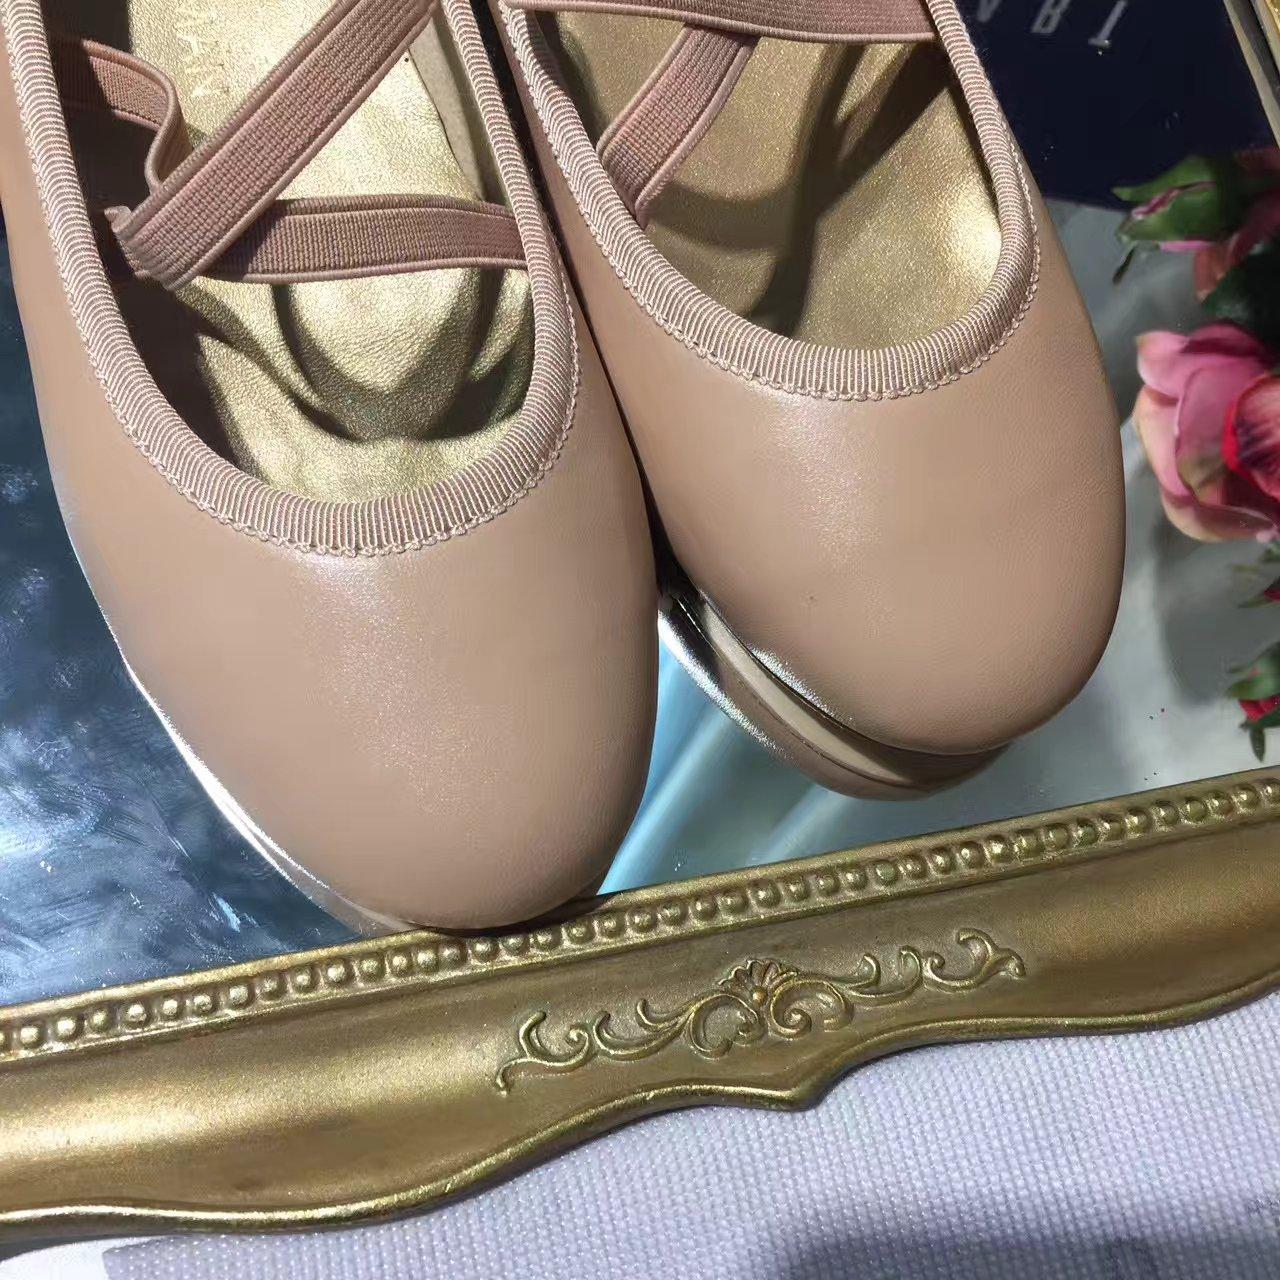 Stuart Weitzman平底单鞋 2017新款芭蕾舞鞋